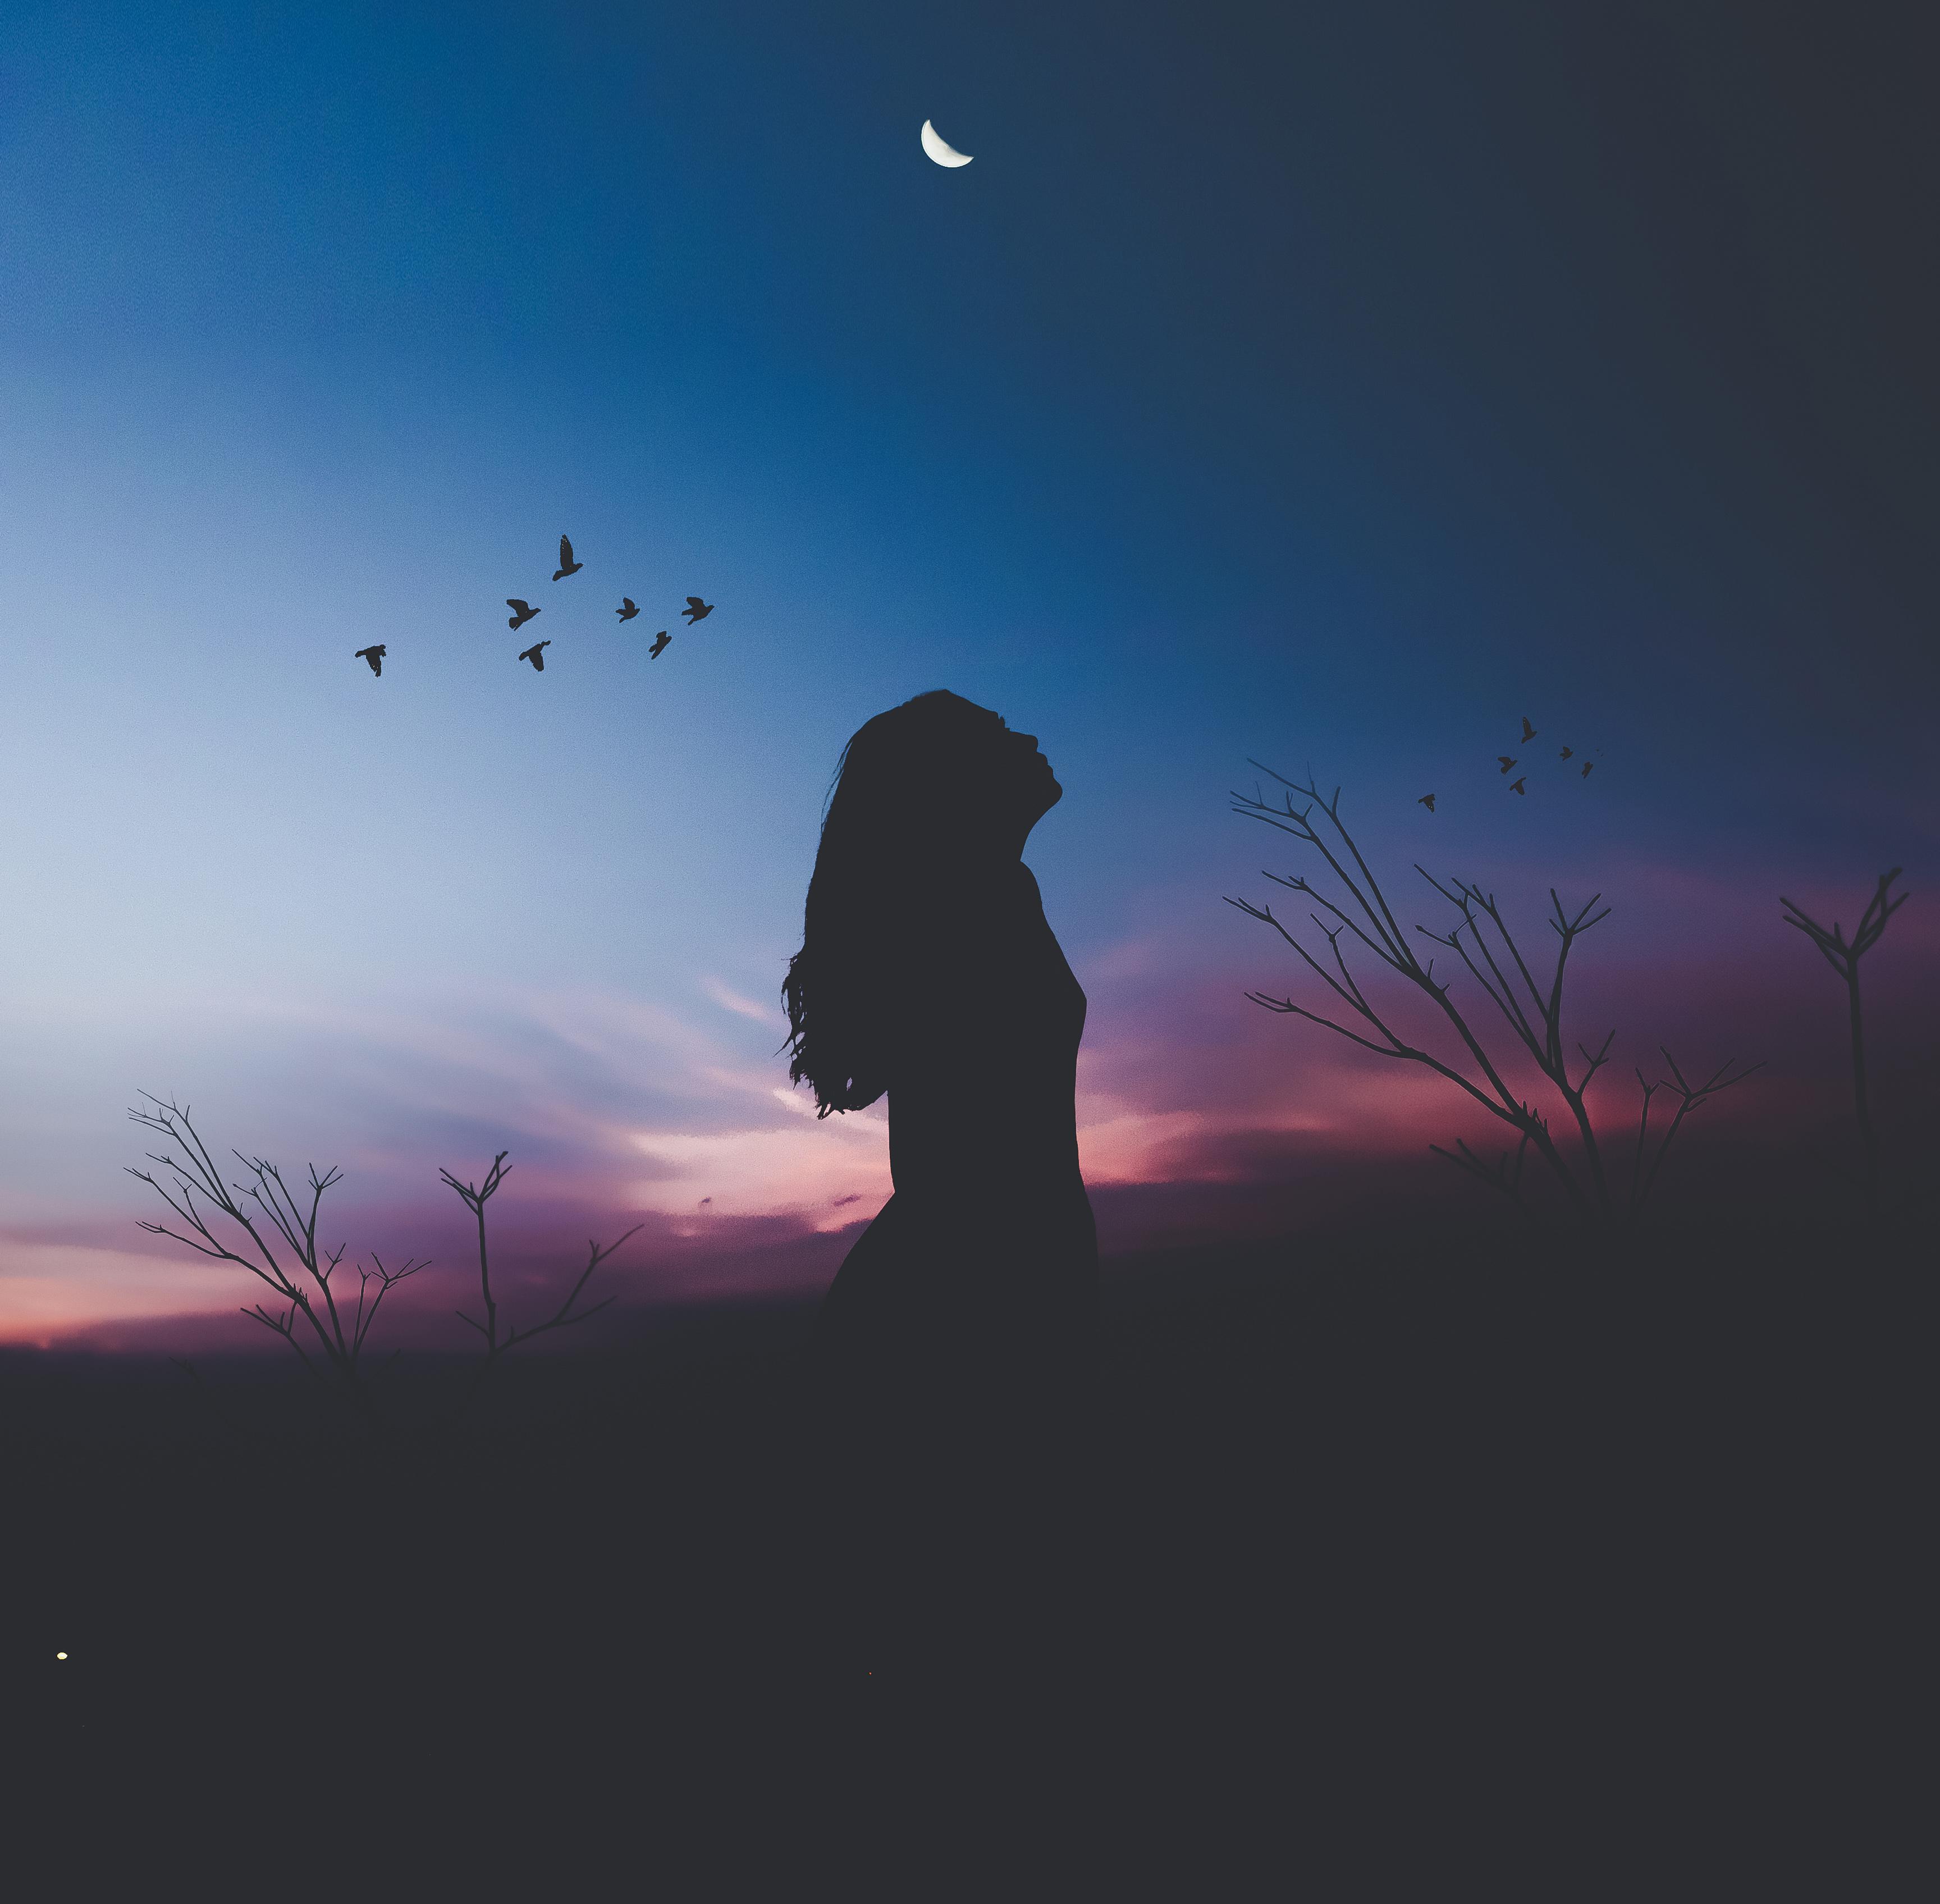 Wallpaper Alone, Woman, Birds, Silhouette, HD, Fantasy, #9662